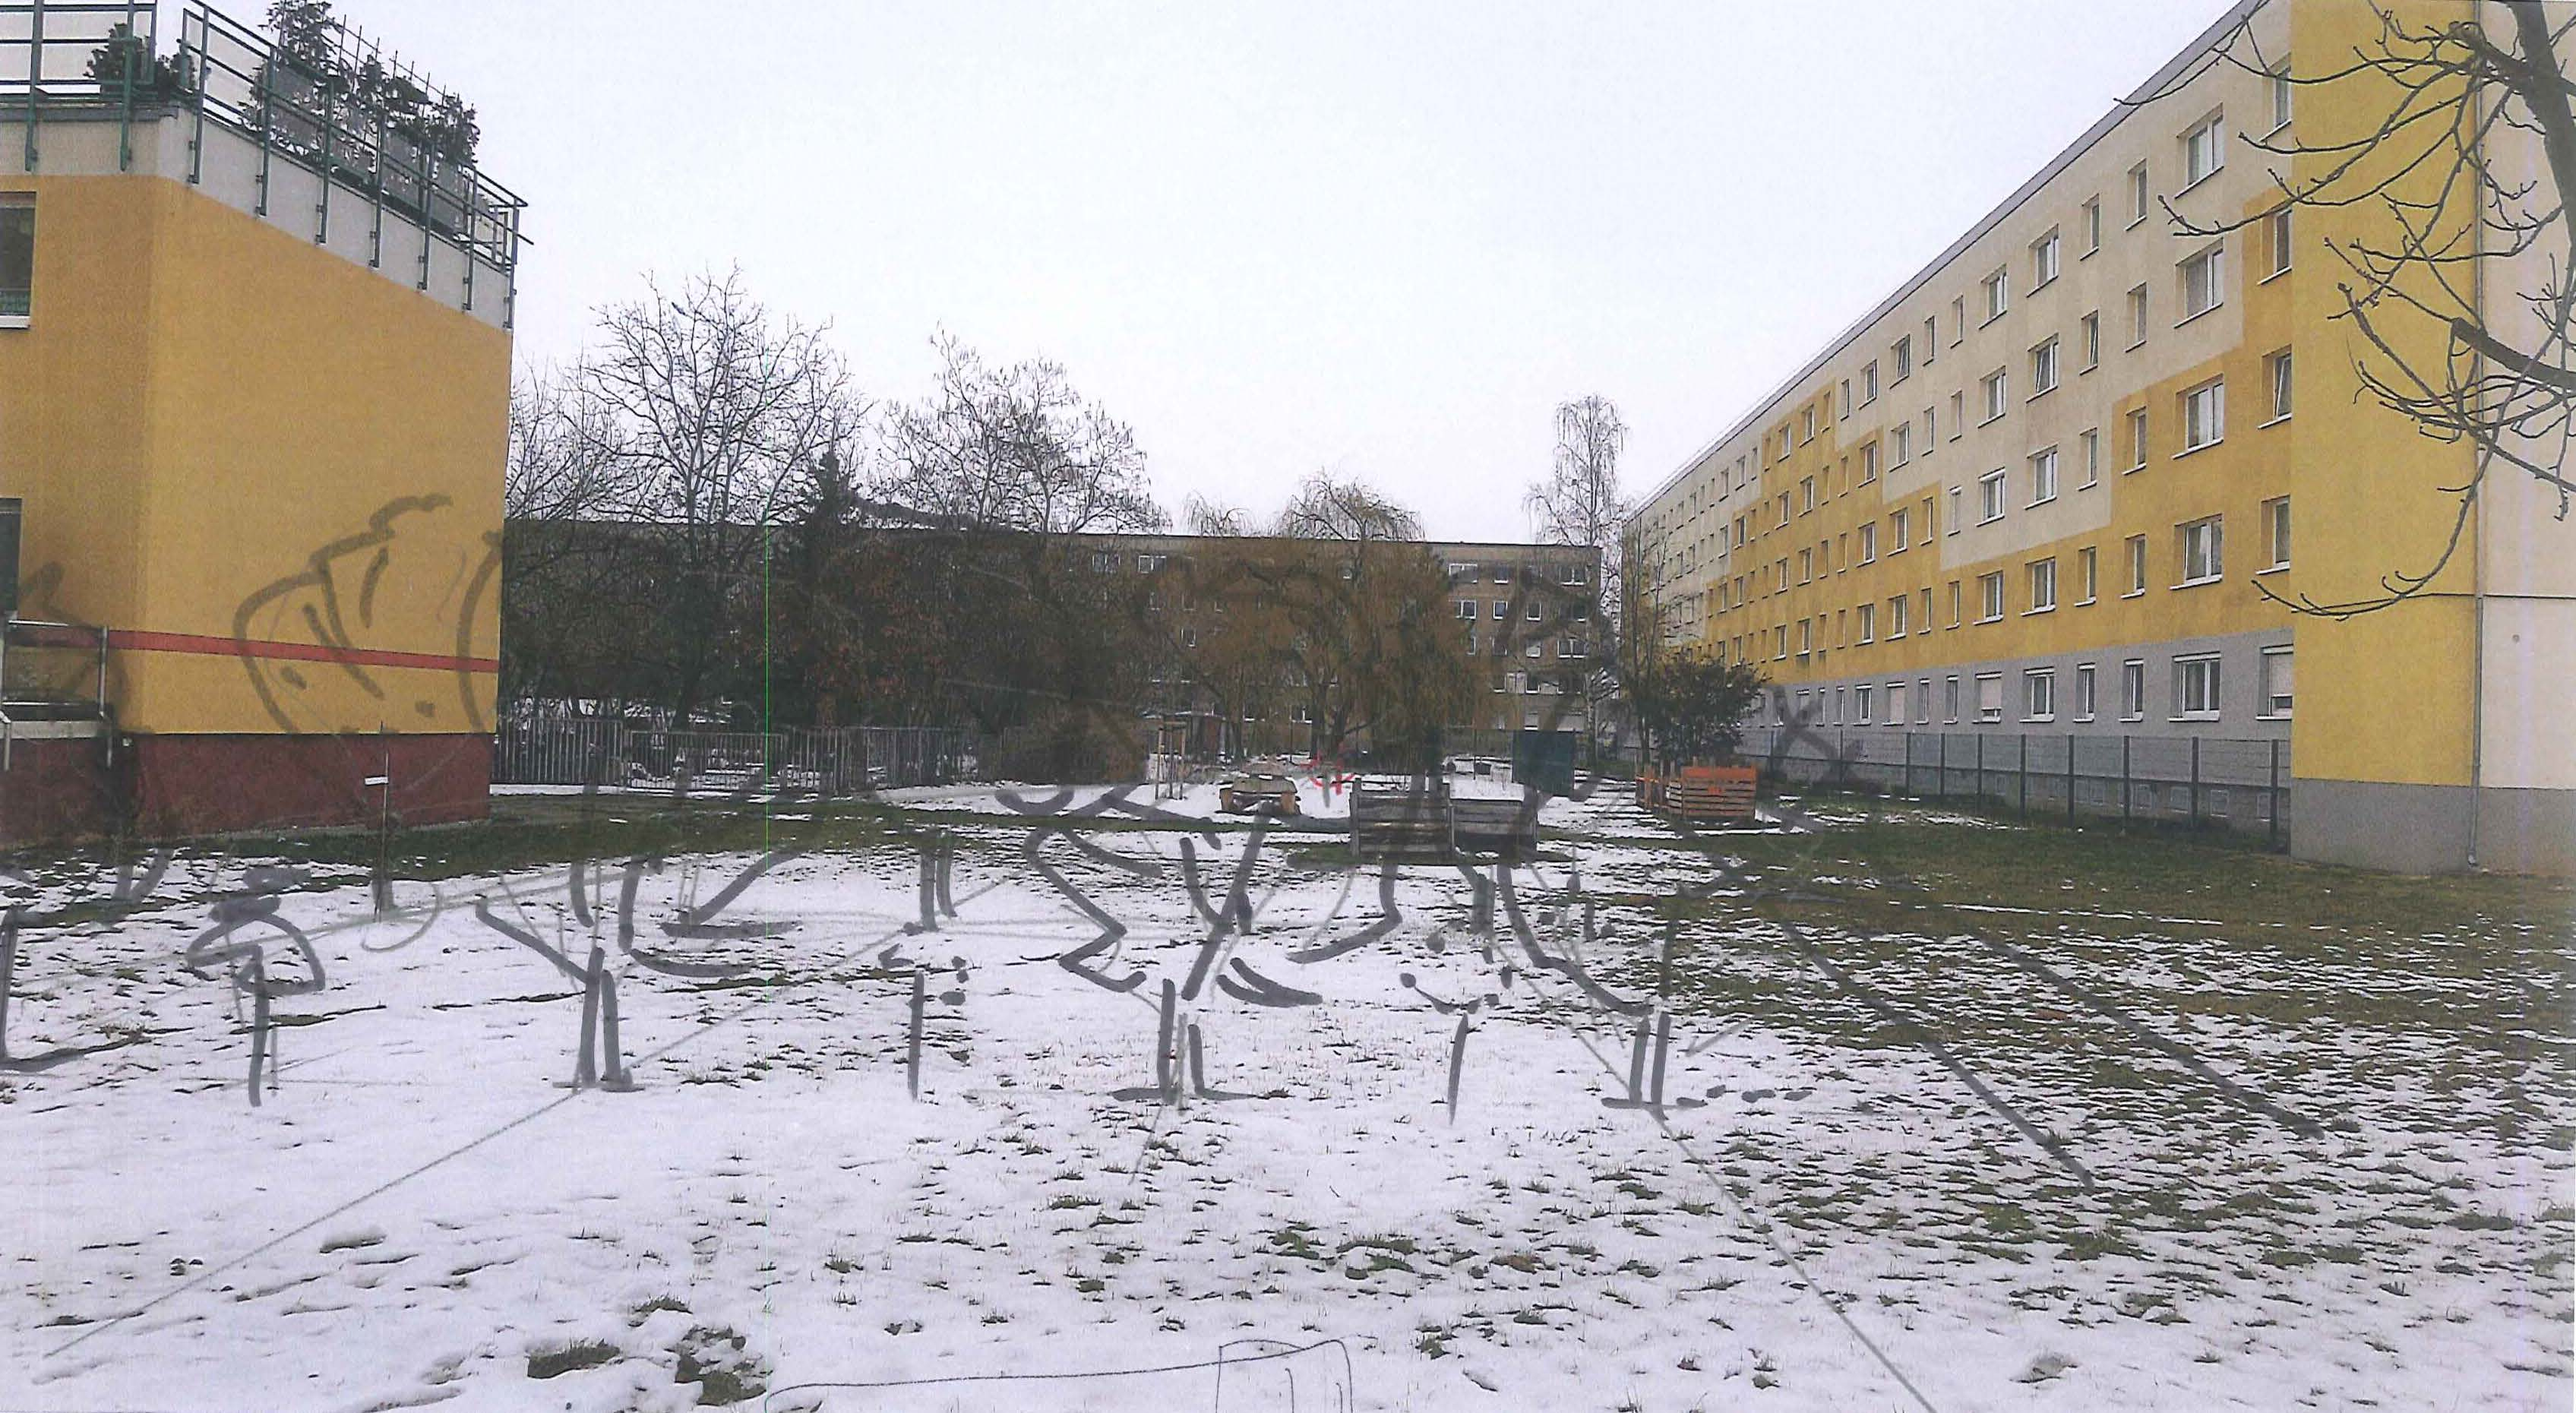 2013-03-13_StandortStreuobstwiese